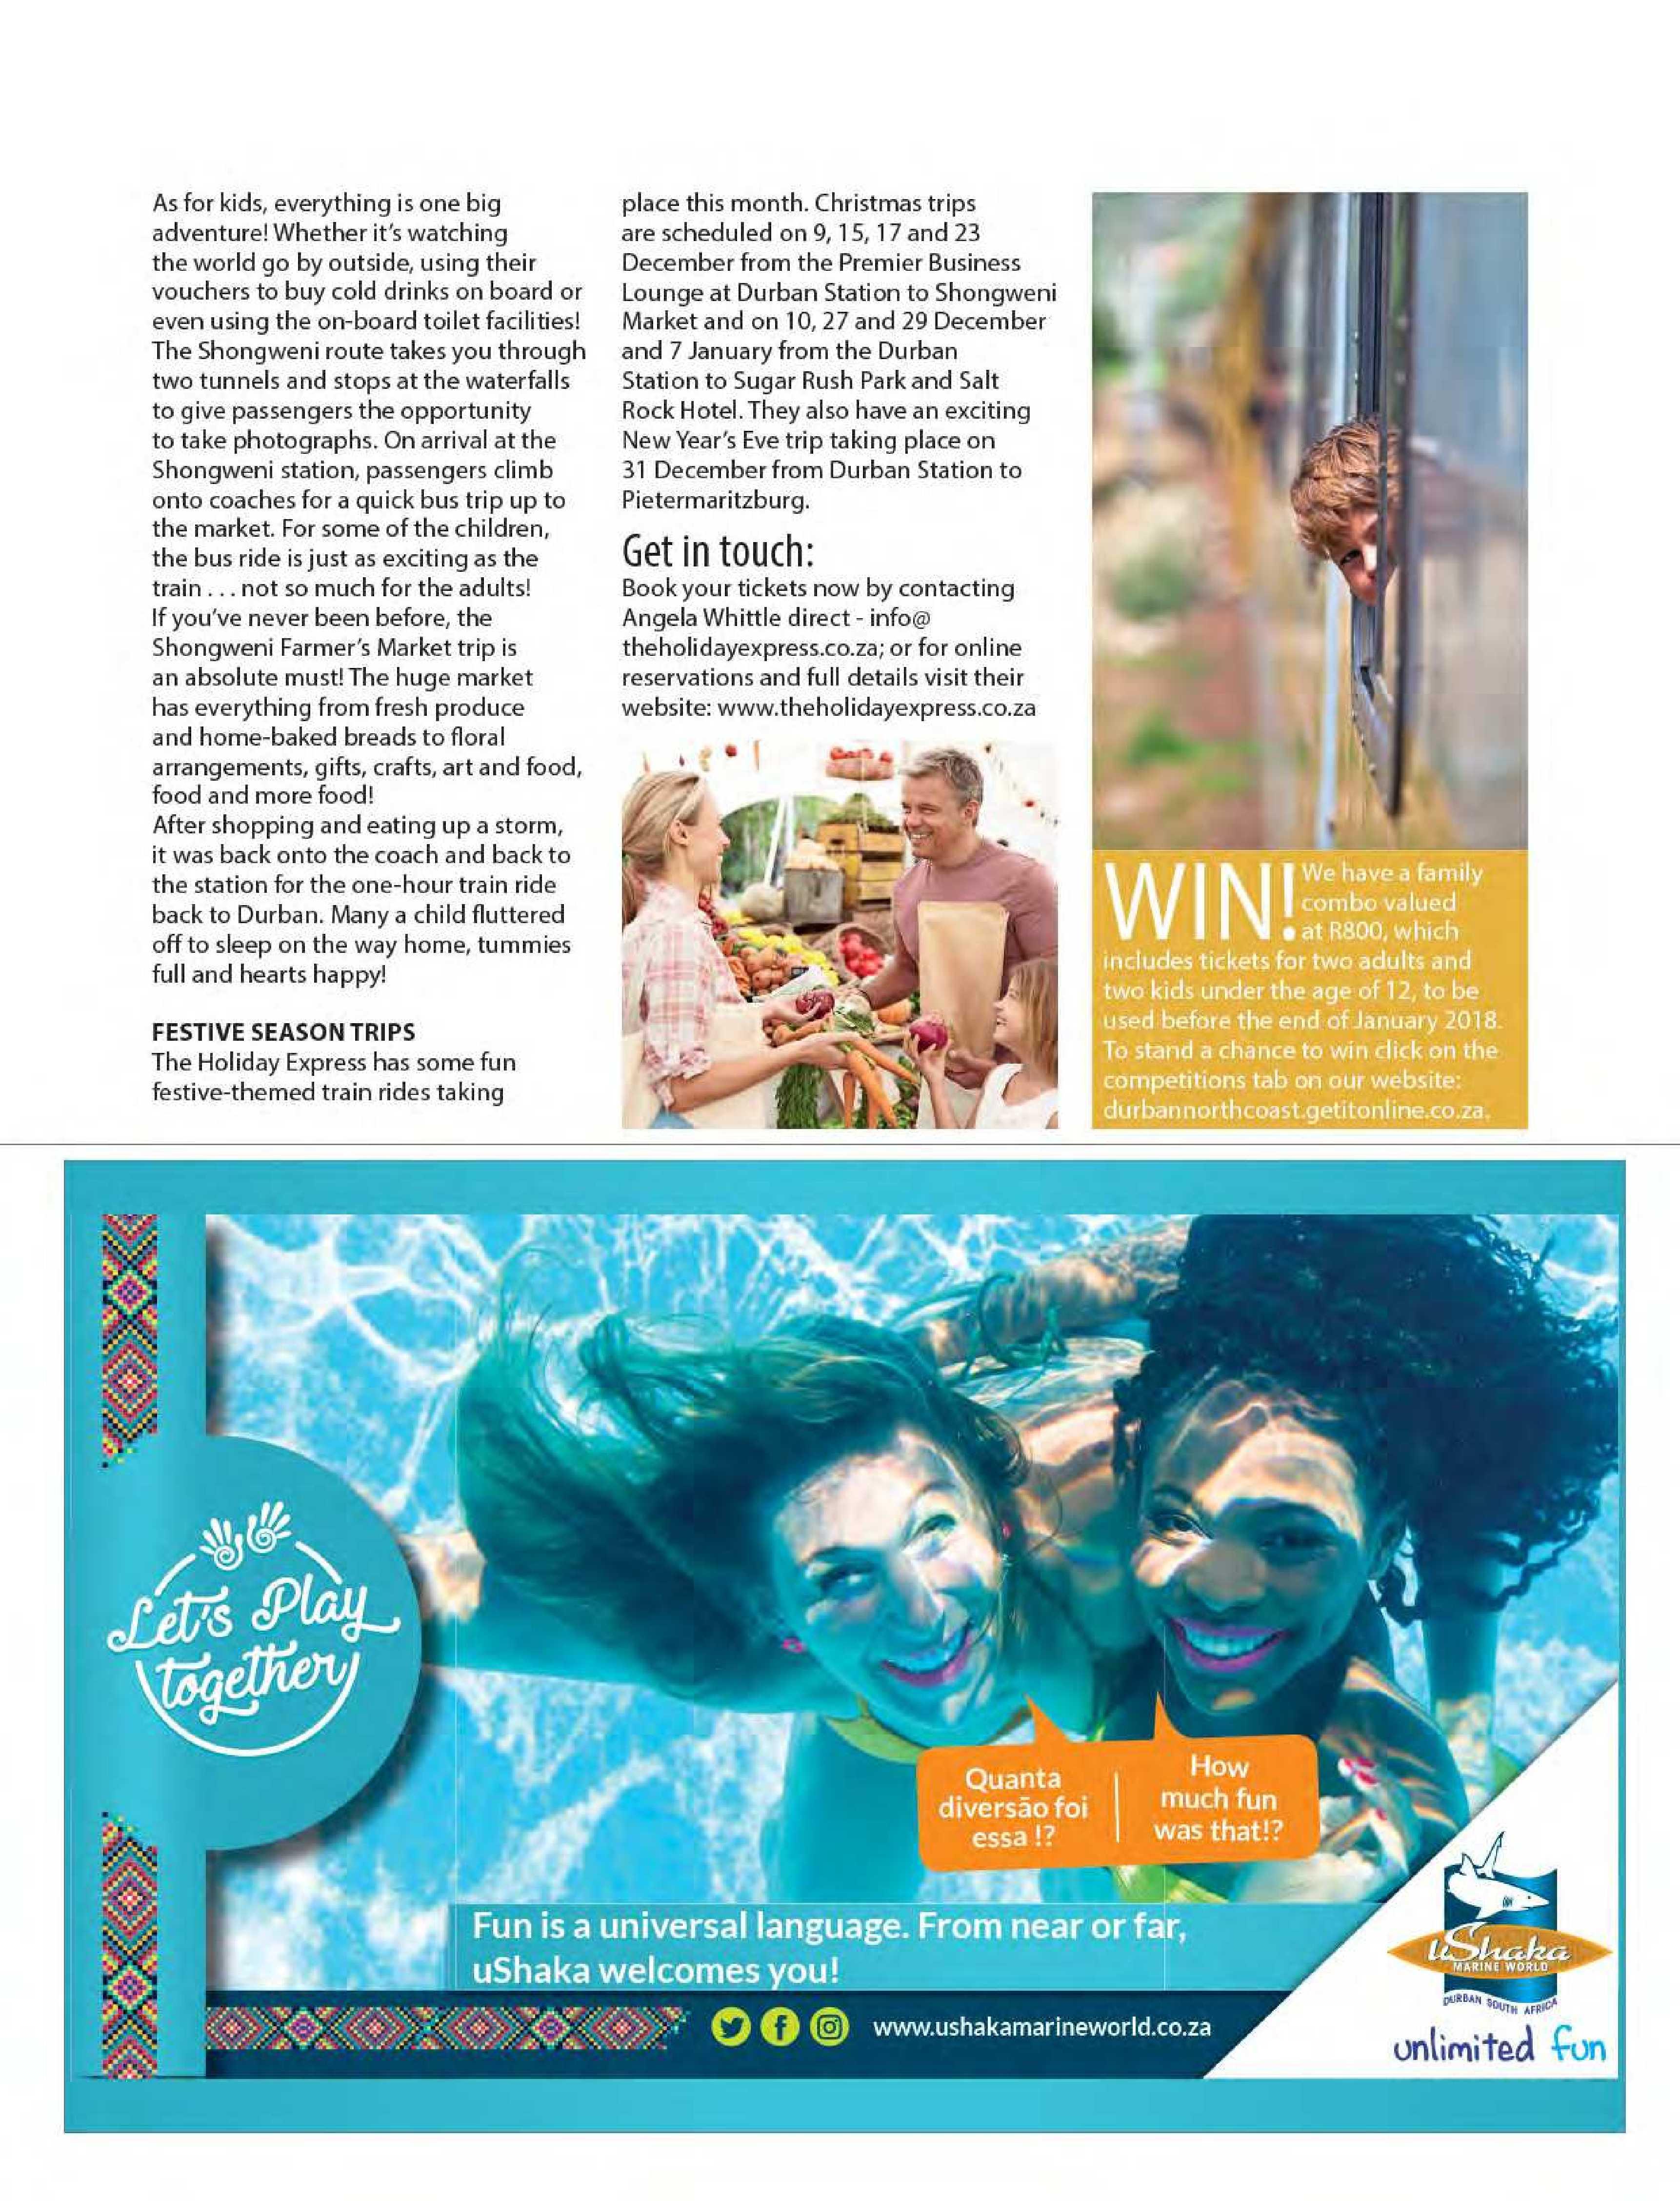 get-magazine-ballitoumhlanga-december-2017-january-2018-2-epapers-page-61